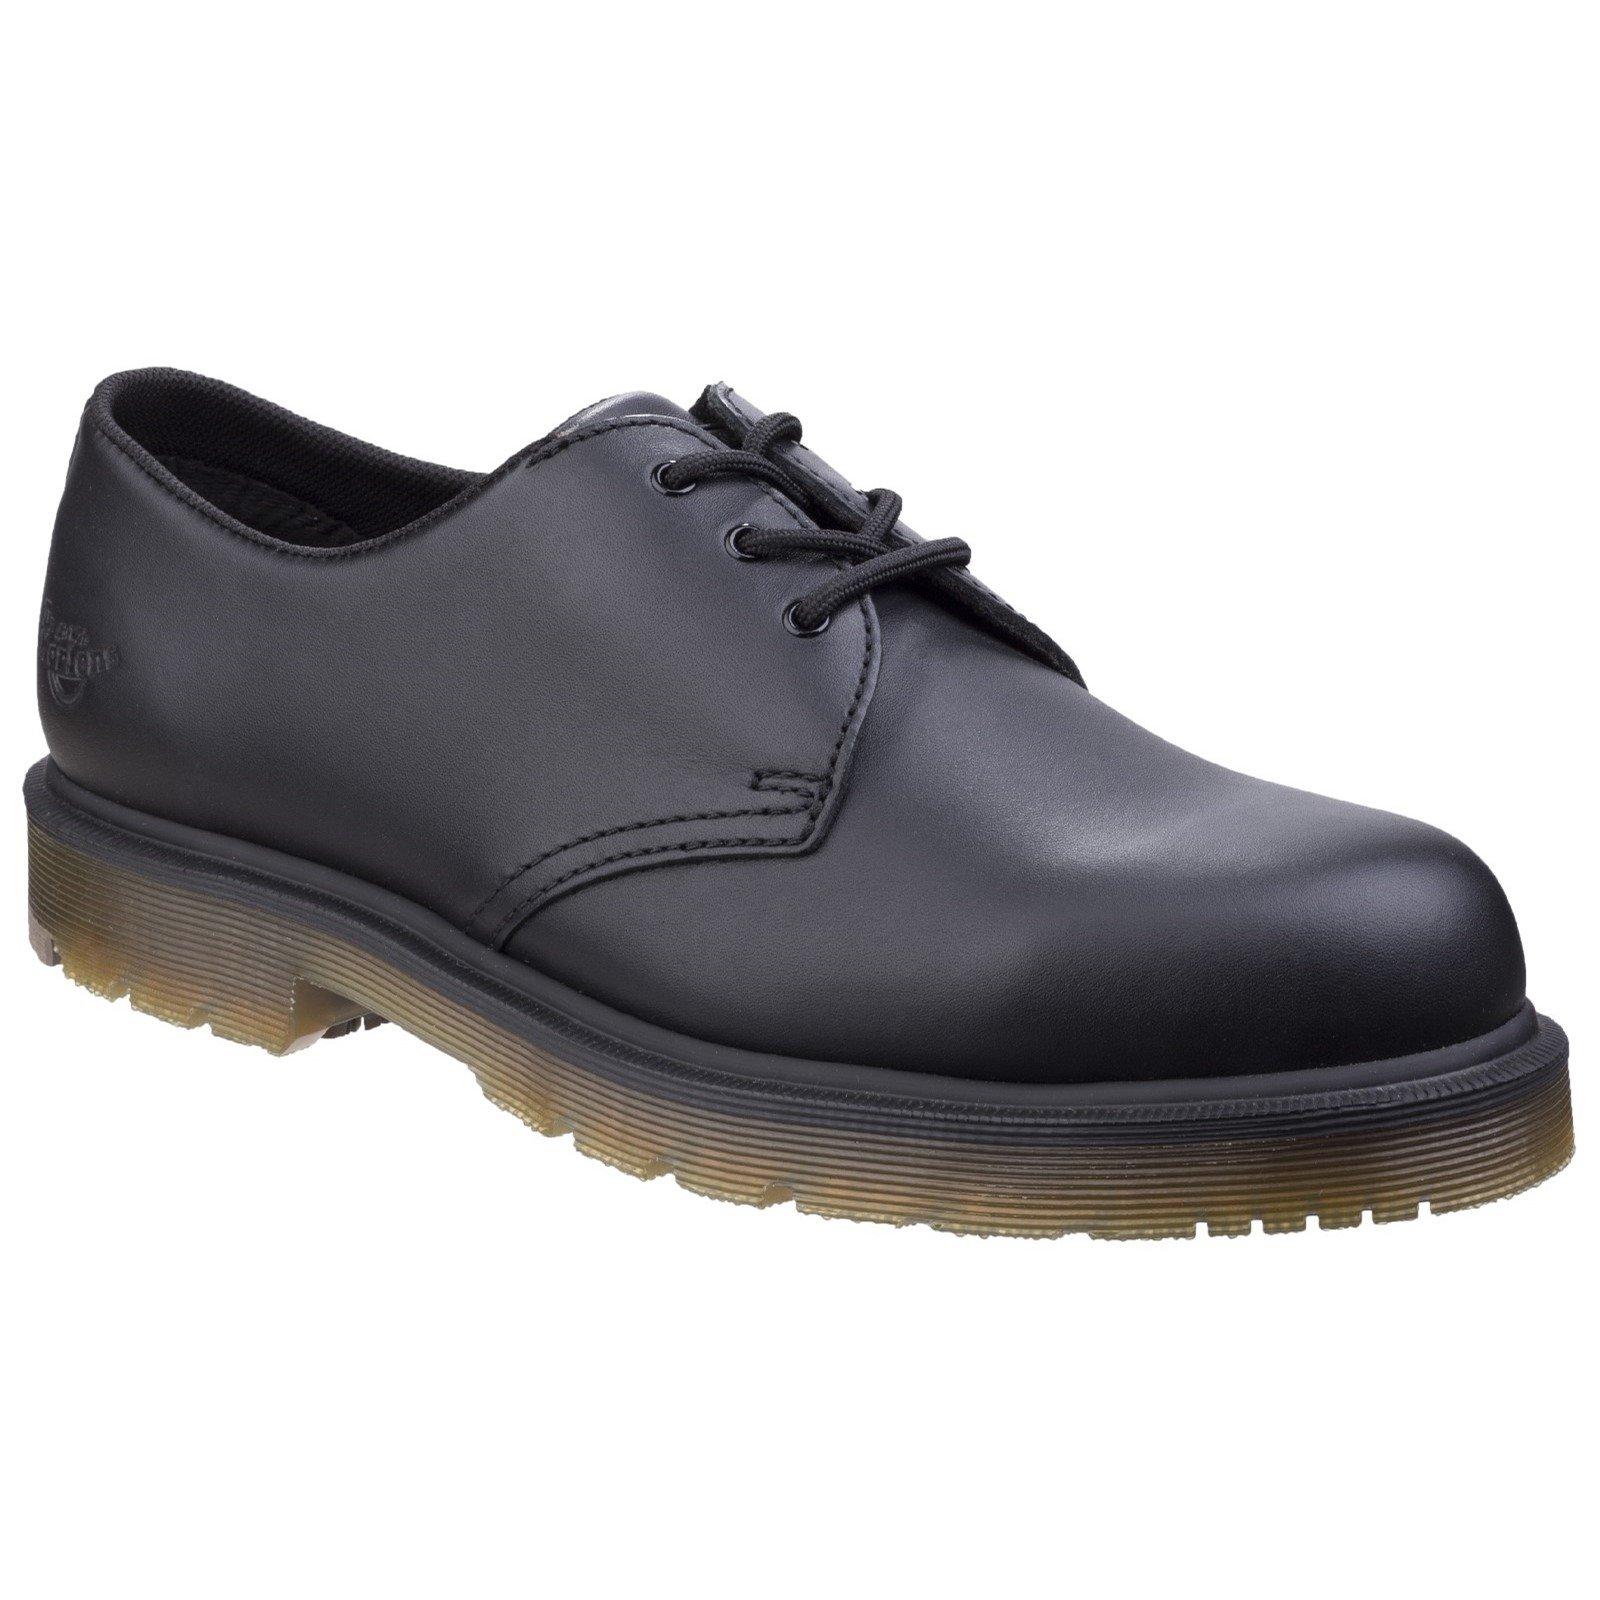 Dr Martens Men's Arlington NS Derby Shoe Black 26781 - Black Industrial Full Grain 6